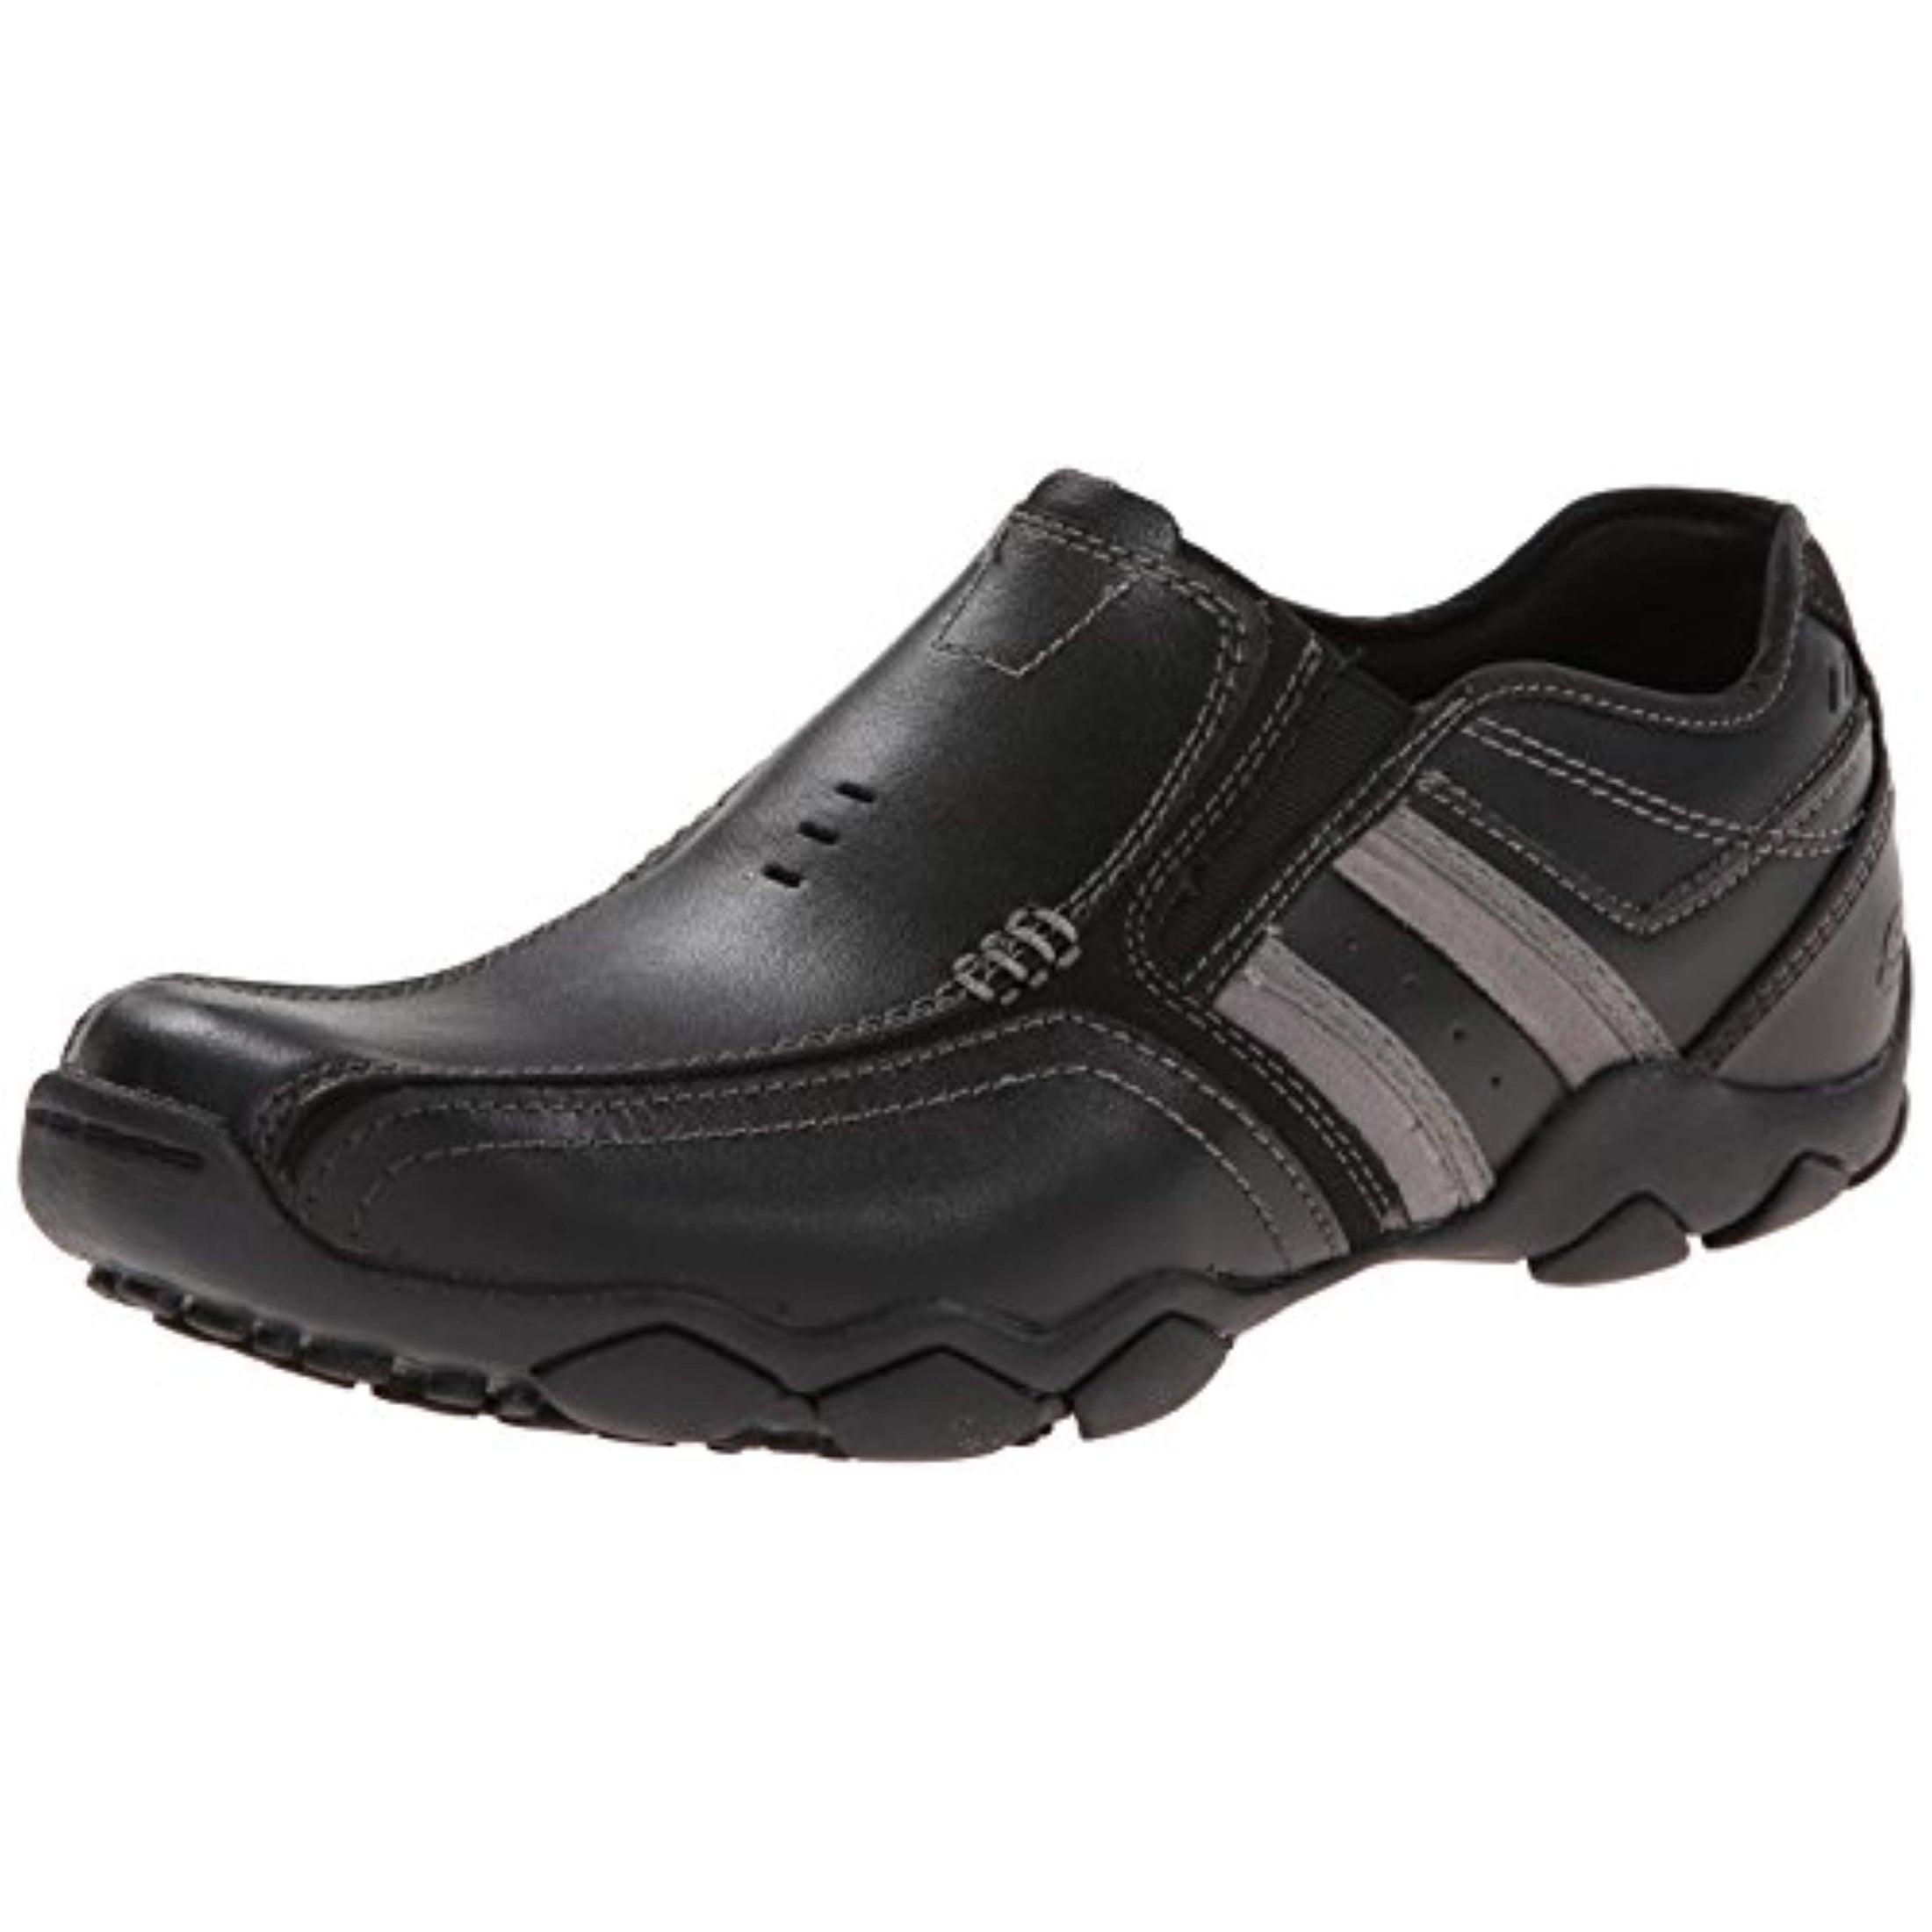 8208df880ba5 Shop Skechers Men s Diameter-Zinroy Slip-On Loafer - Free Shipping Today -  Overstock - 27120991